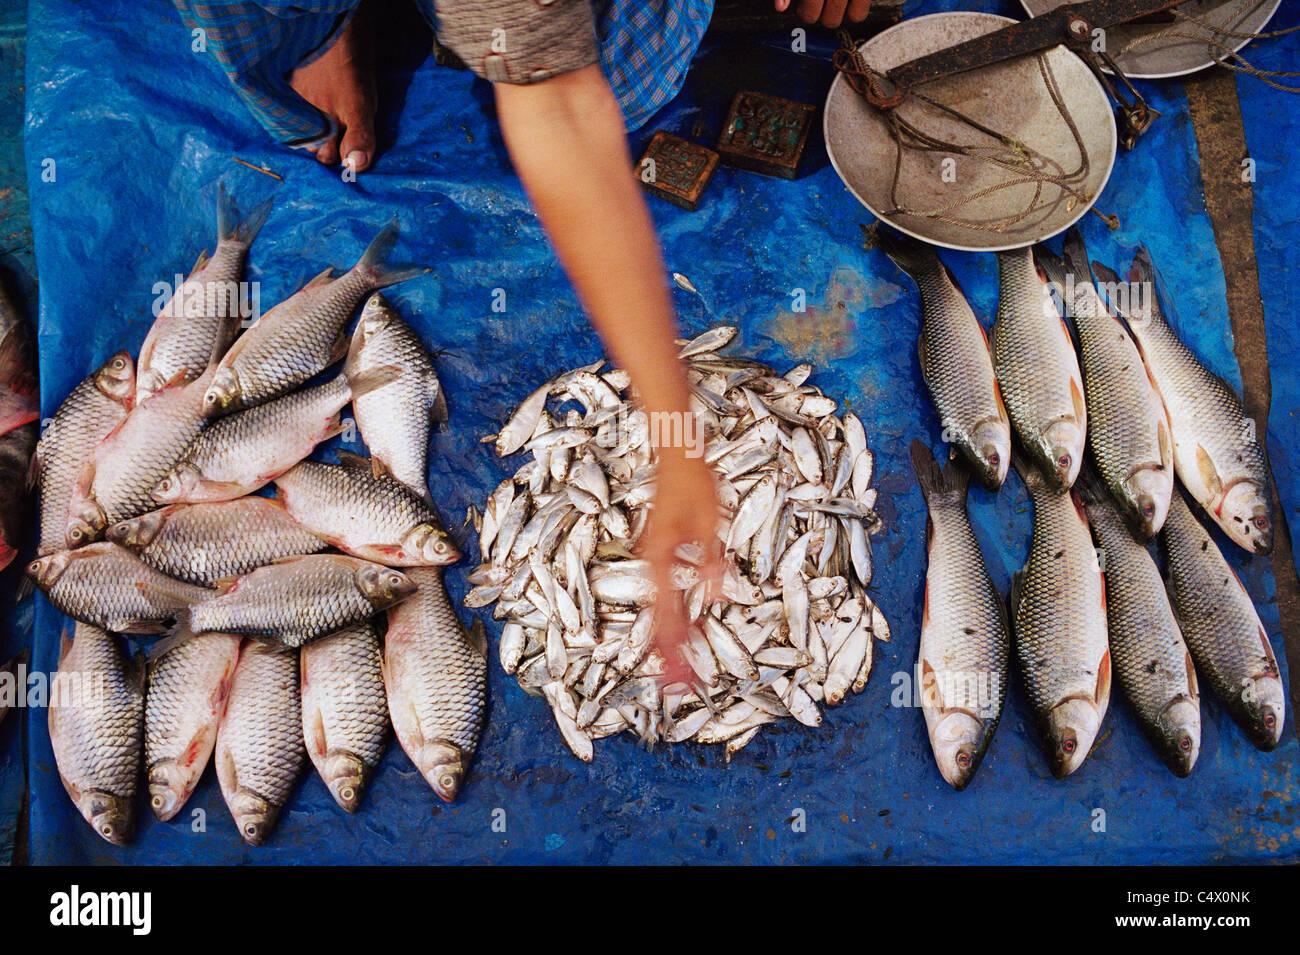 Mercato del Pesce, Bhatiary, Bangladesh Immagini Stock